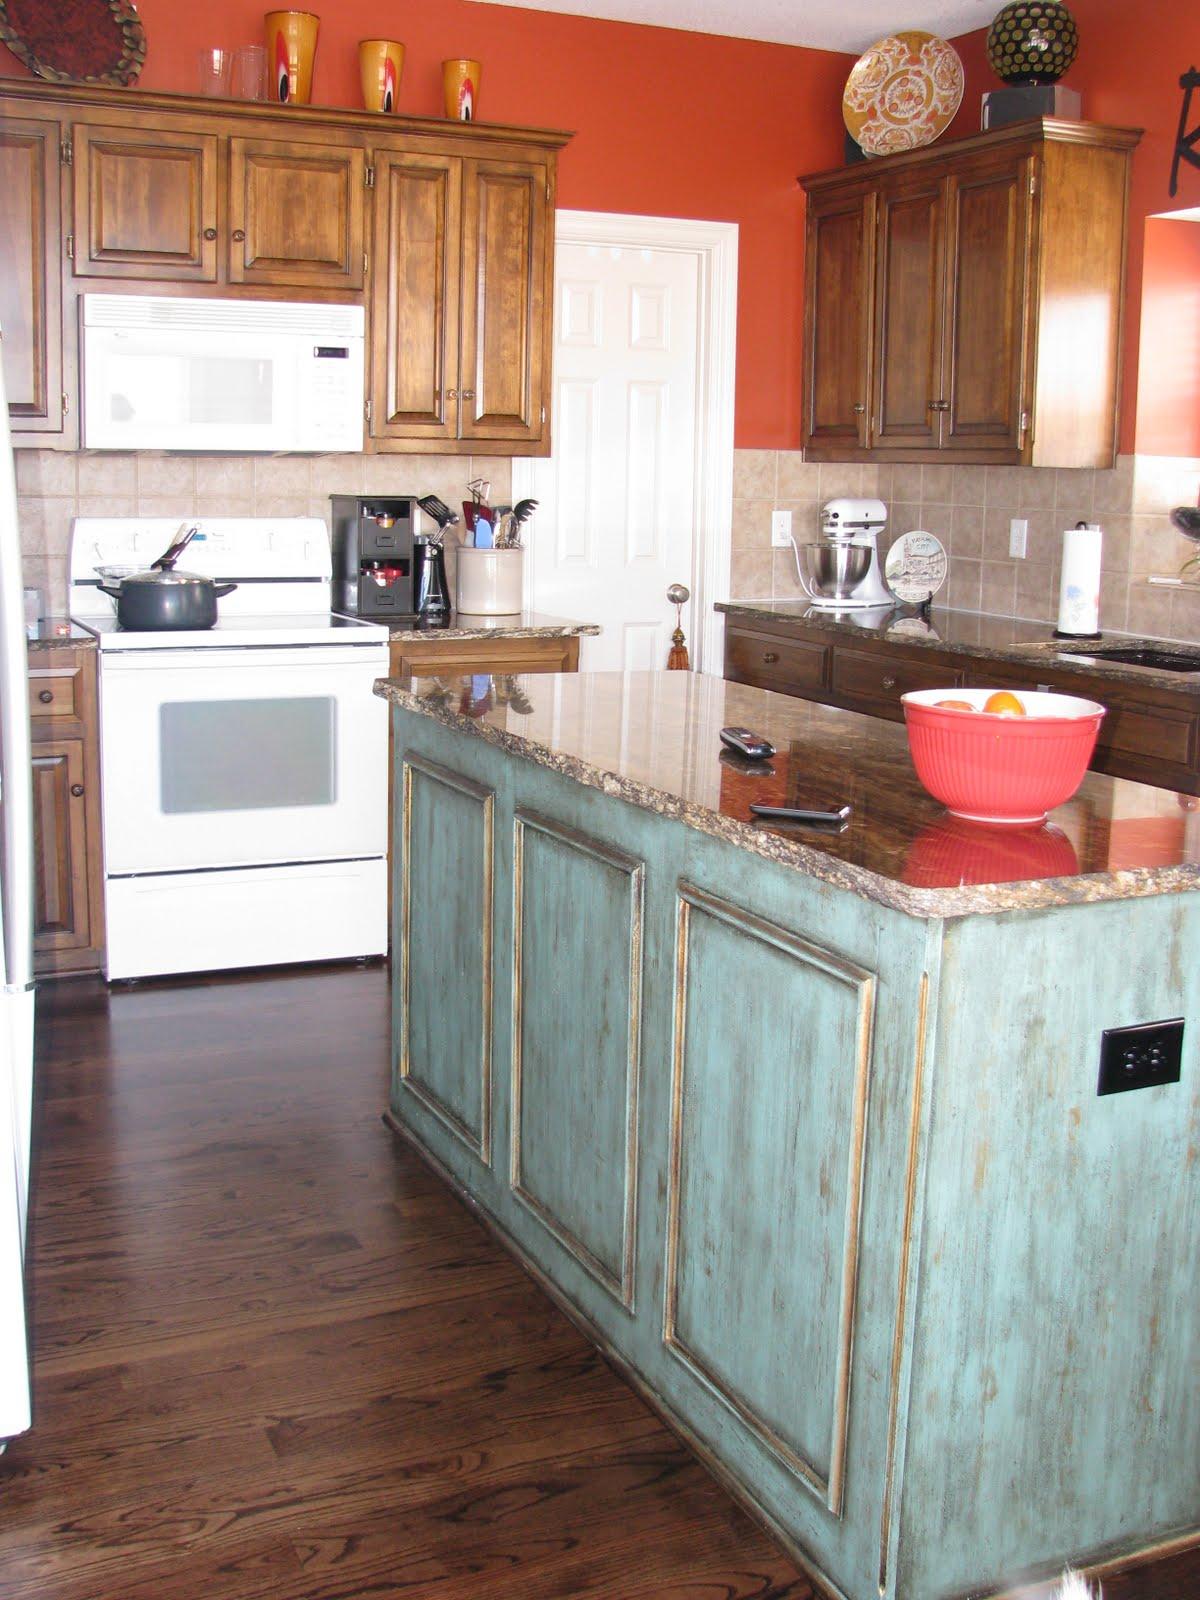 Warning island in this blog post is prettier than it for Como forrar muebles de cocina